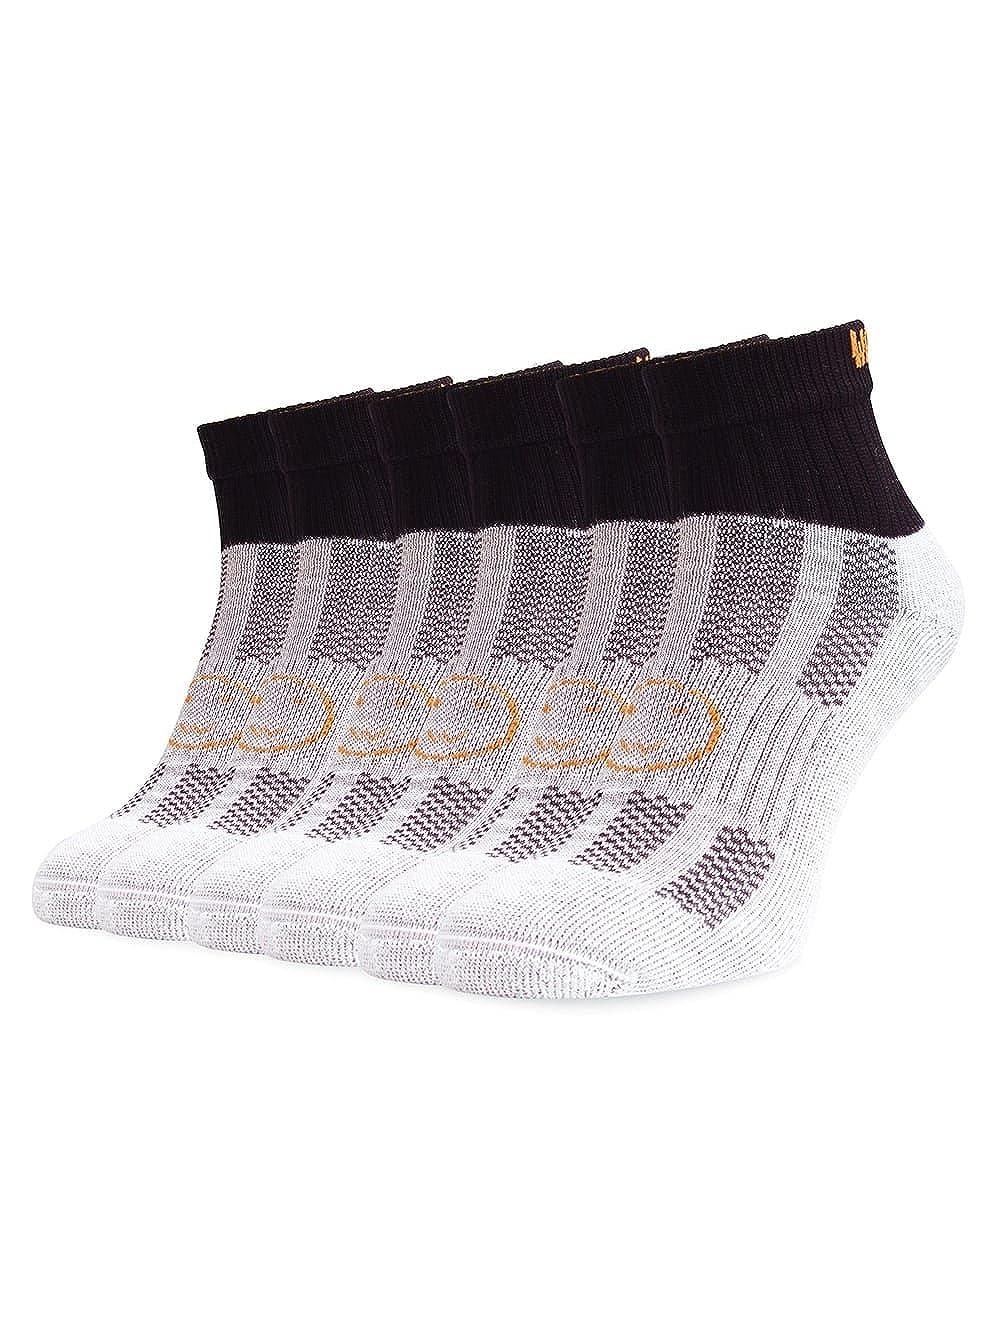 WackySox Three Pairs Supersaver Ankle Running Sports Socks Black